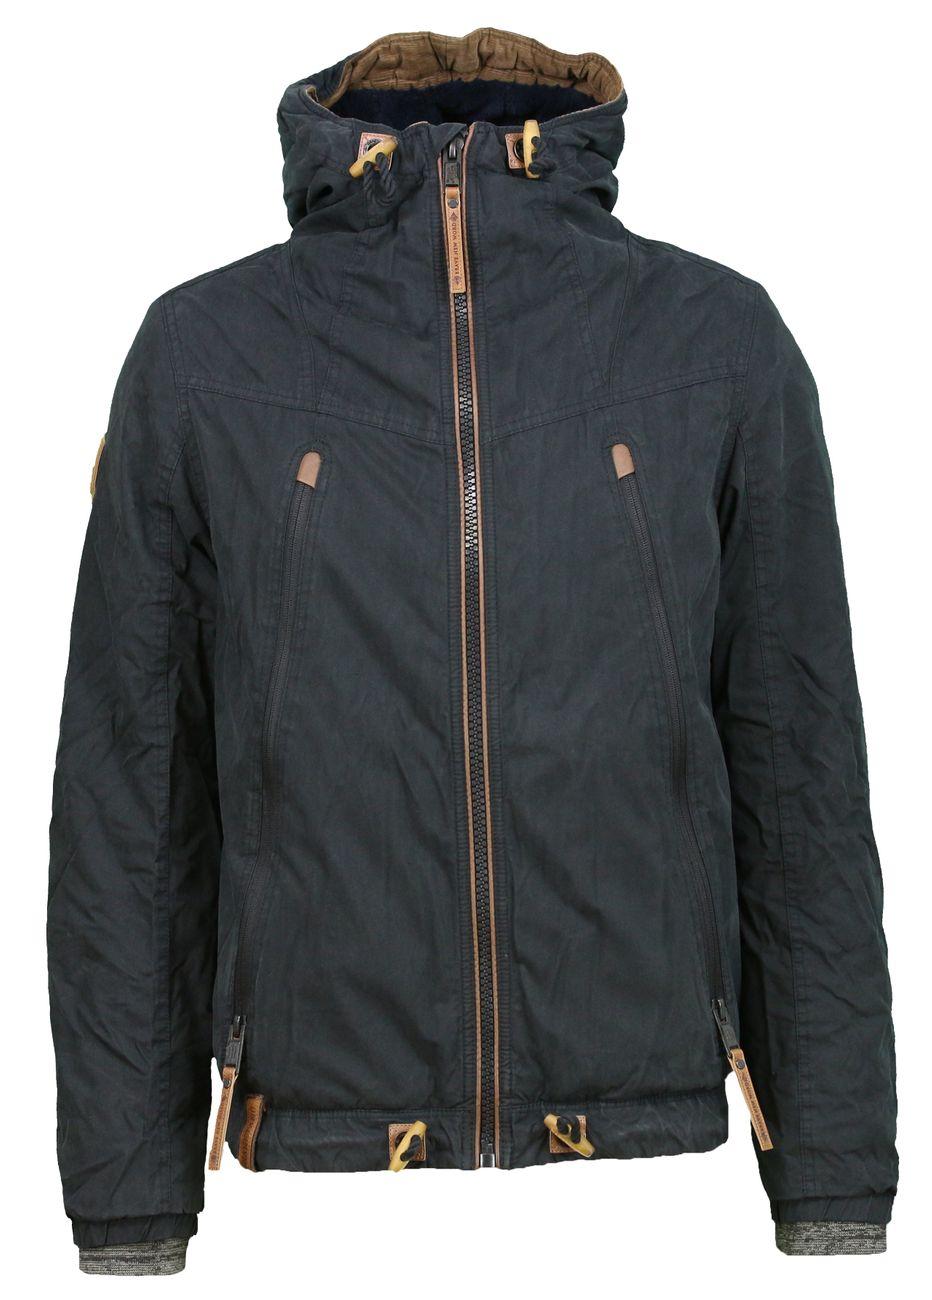 NAKETANO Dildo Junkie III Jacket for Men Green